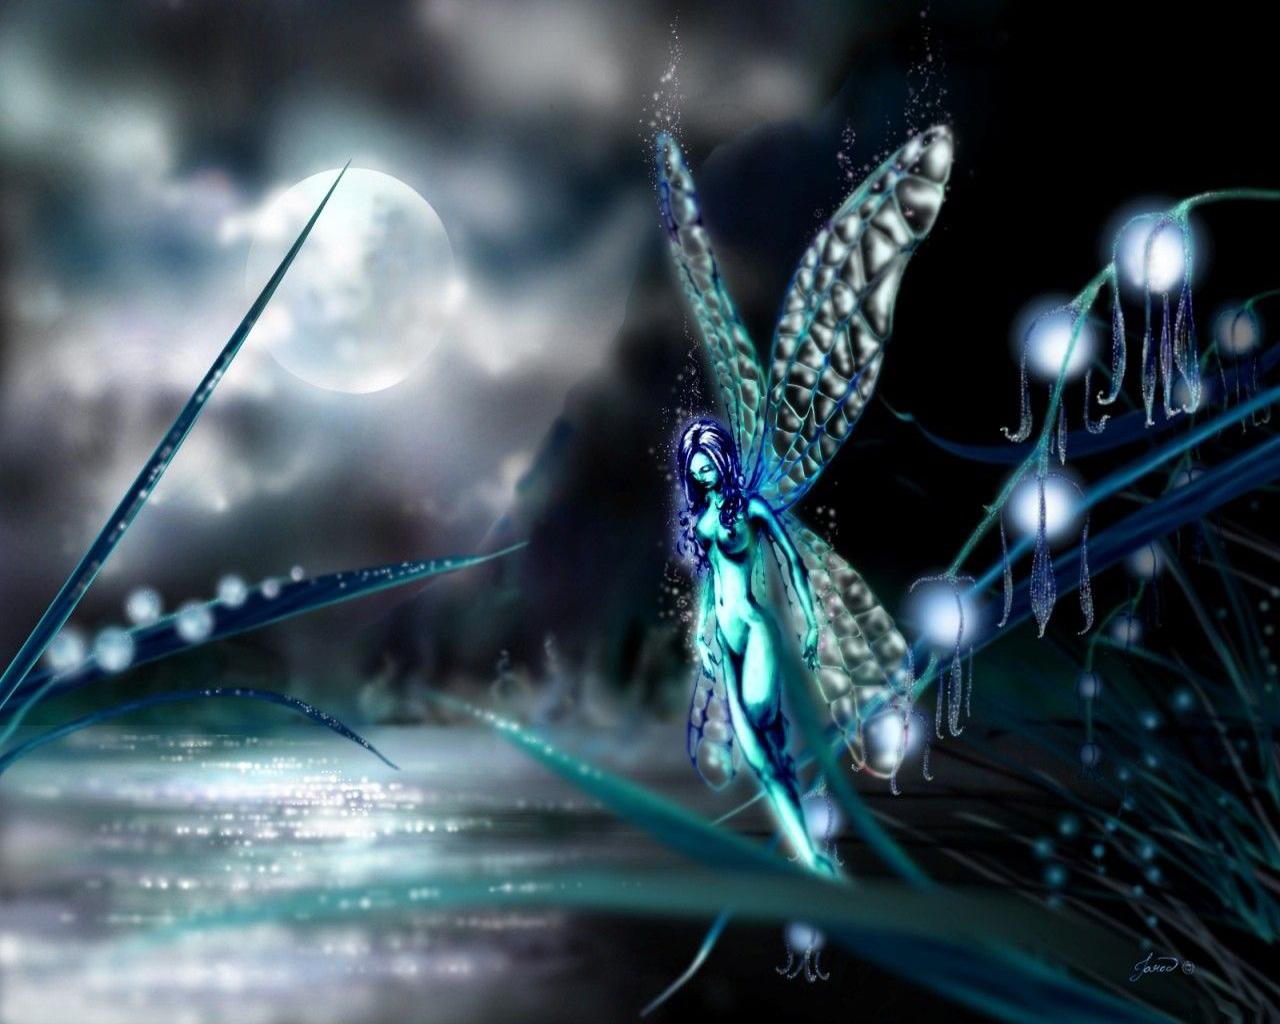 http://1.bp.blogspot.com/-z1z4Qxle3sU/T7DN7KCL3oI/AAAAAAAAAo8/7s6DoEjBsi4/s1600/hinh-nen-3d-15.jpg